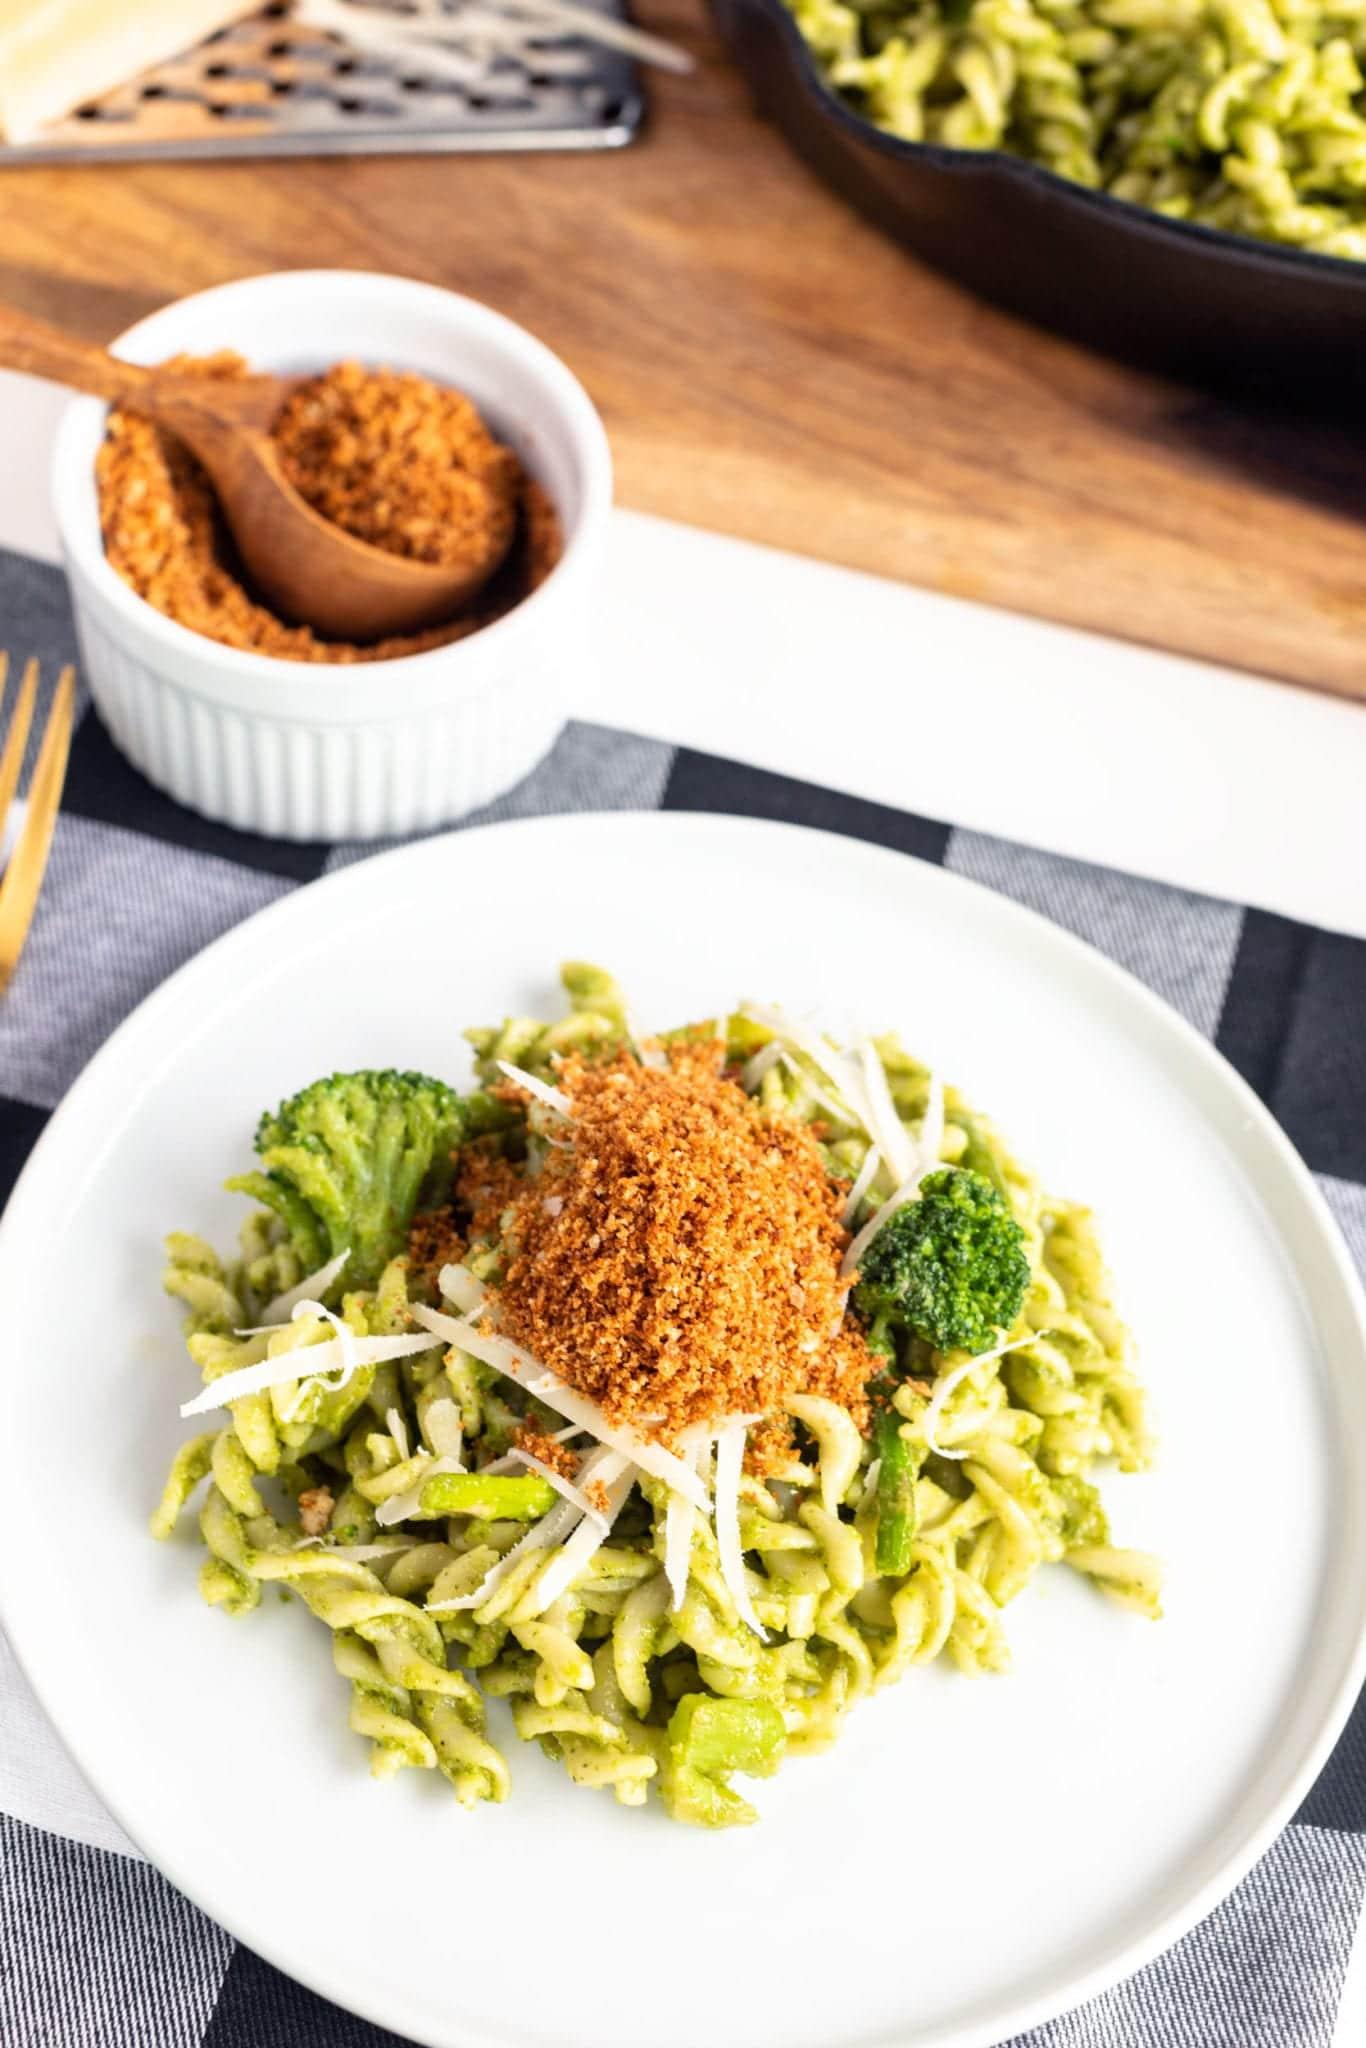 Fusilli Pasta & Fresh Basil Pesto with Toasted Breadcrumbs on white plate with plaid napkin. #pestopasta #easyrecipes #fusilli #greenrecipes #weeknightrecipes #pastadish #pasta #breadcrumbs #massimobottura